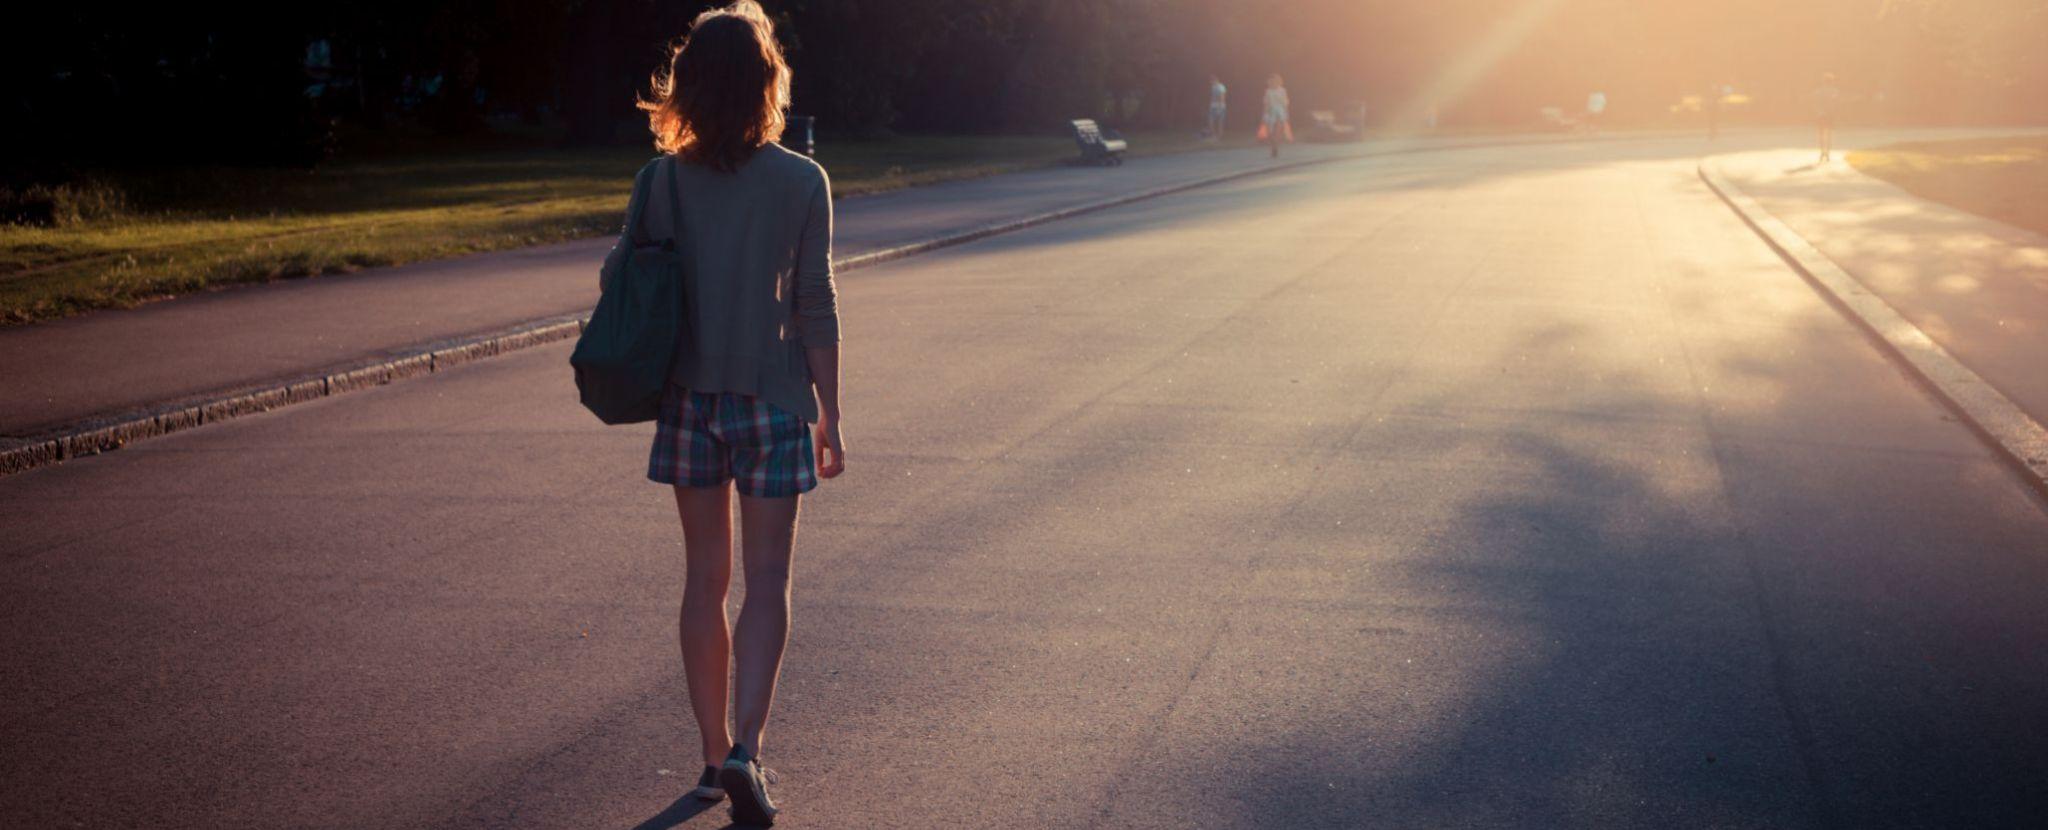 walking down a road